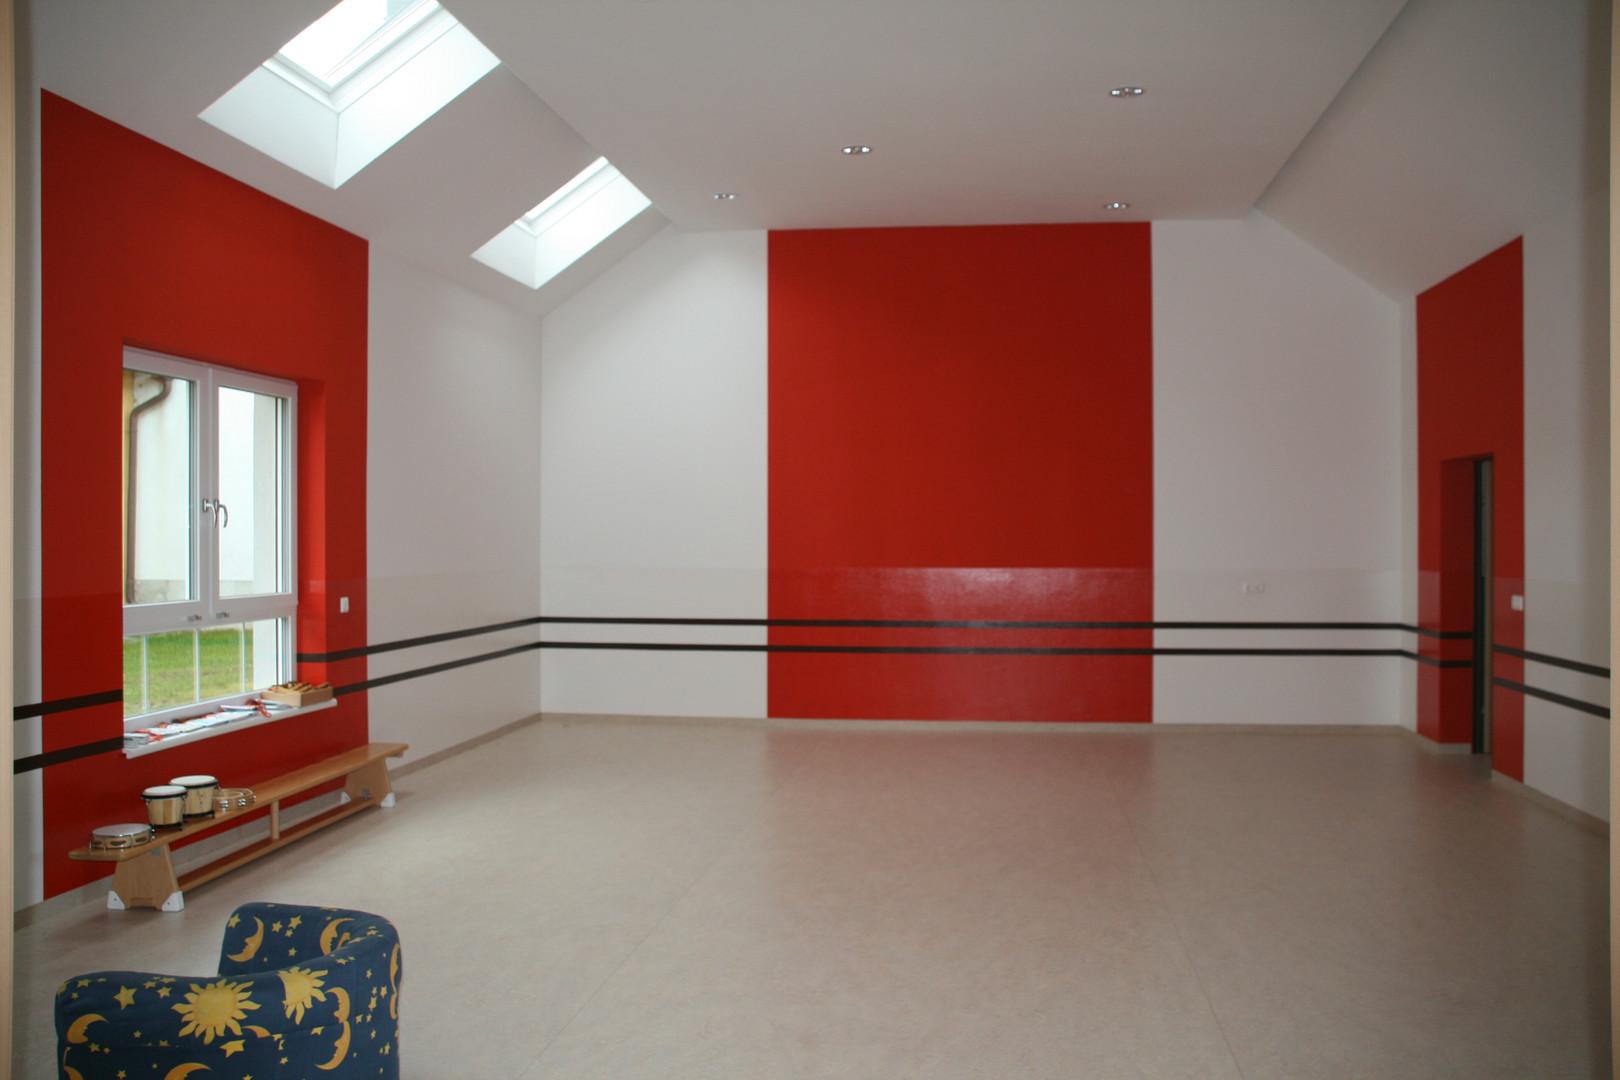 Kindergarten Zubau hausbrunn 03.jpg